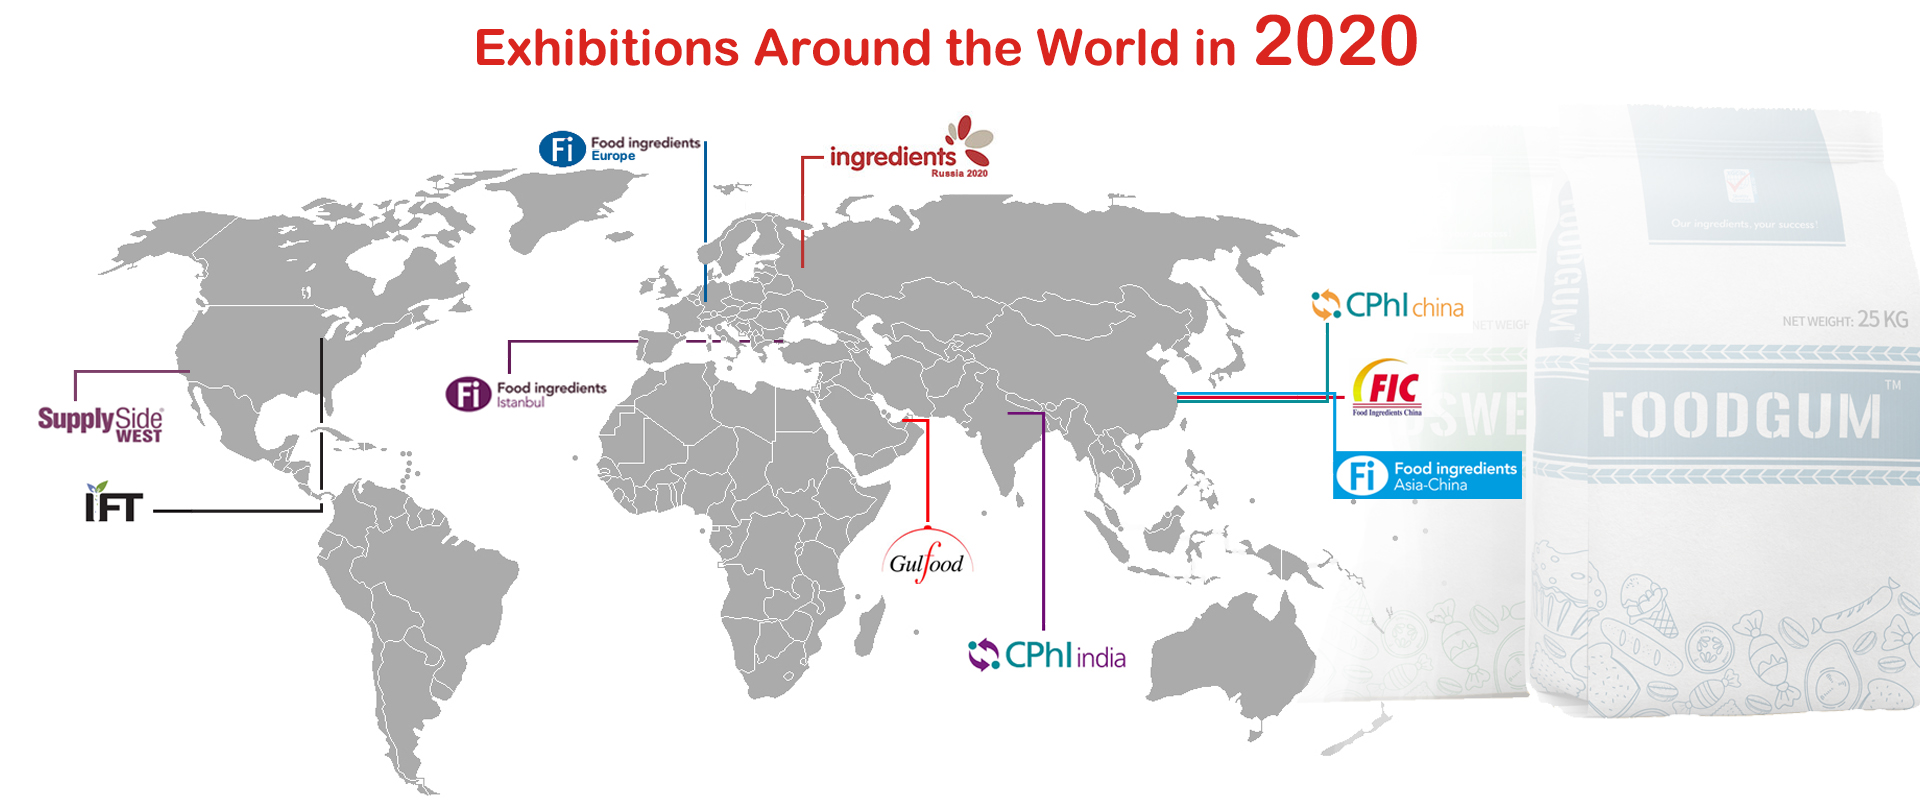 Foodchem World Exhibition 2020